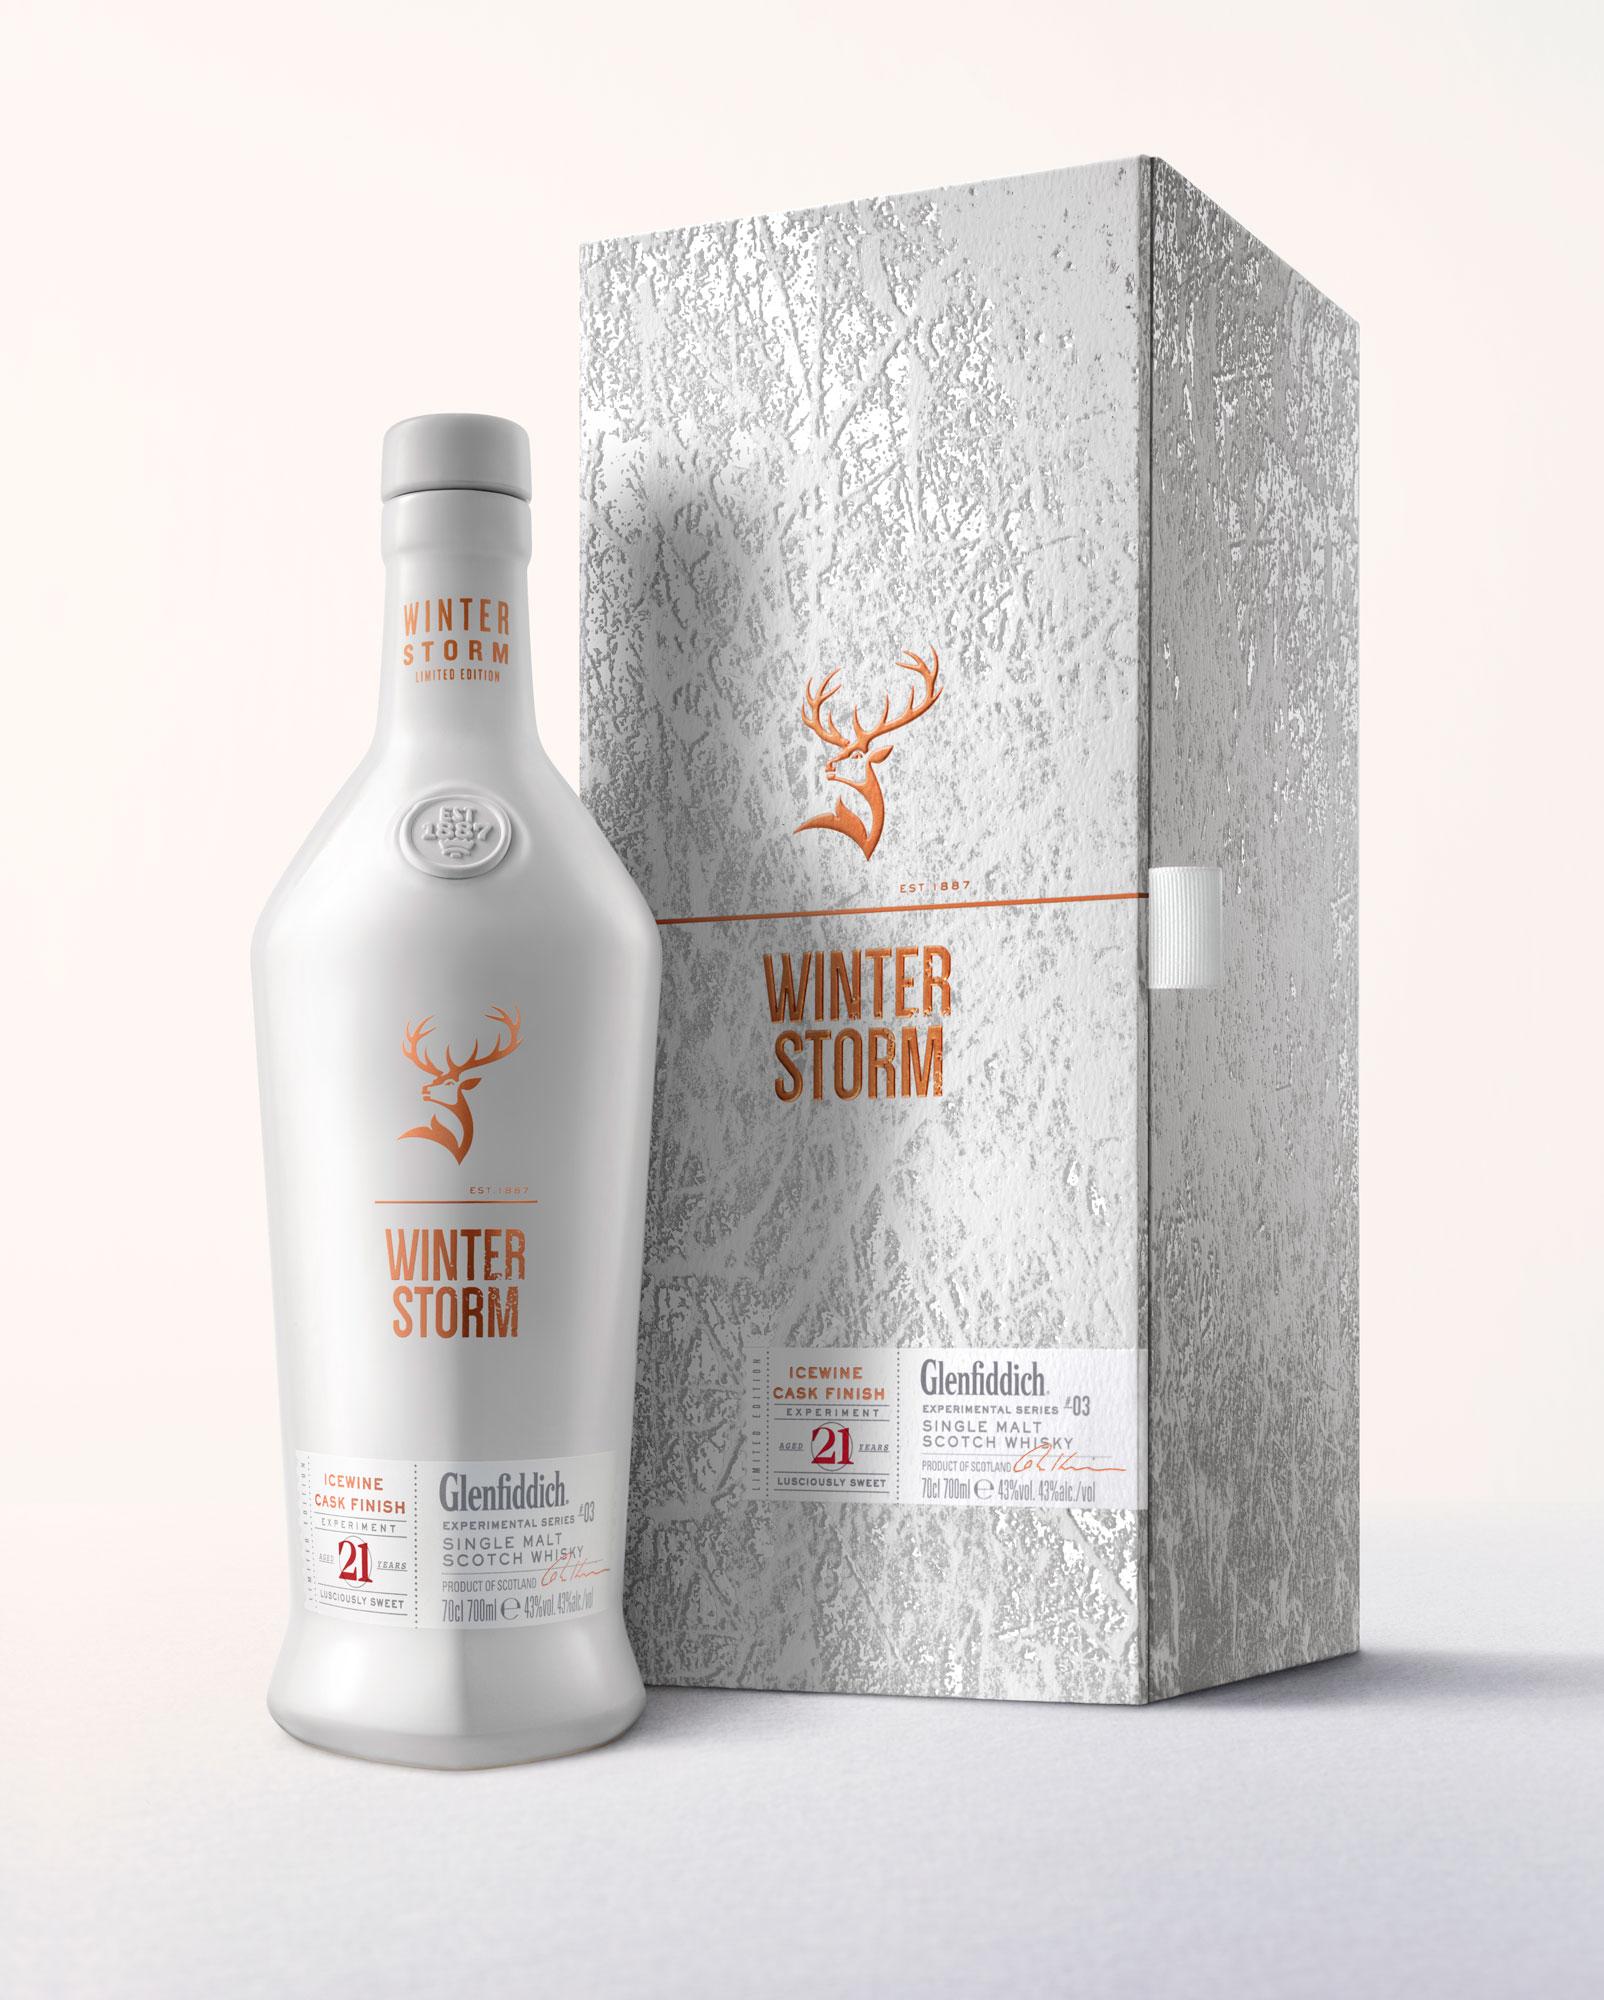 Glenfiddich Winter Storm Whisky.